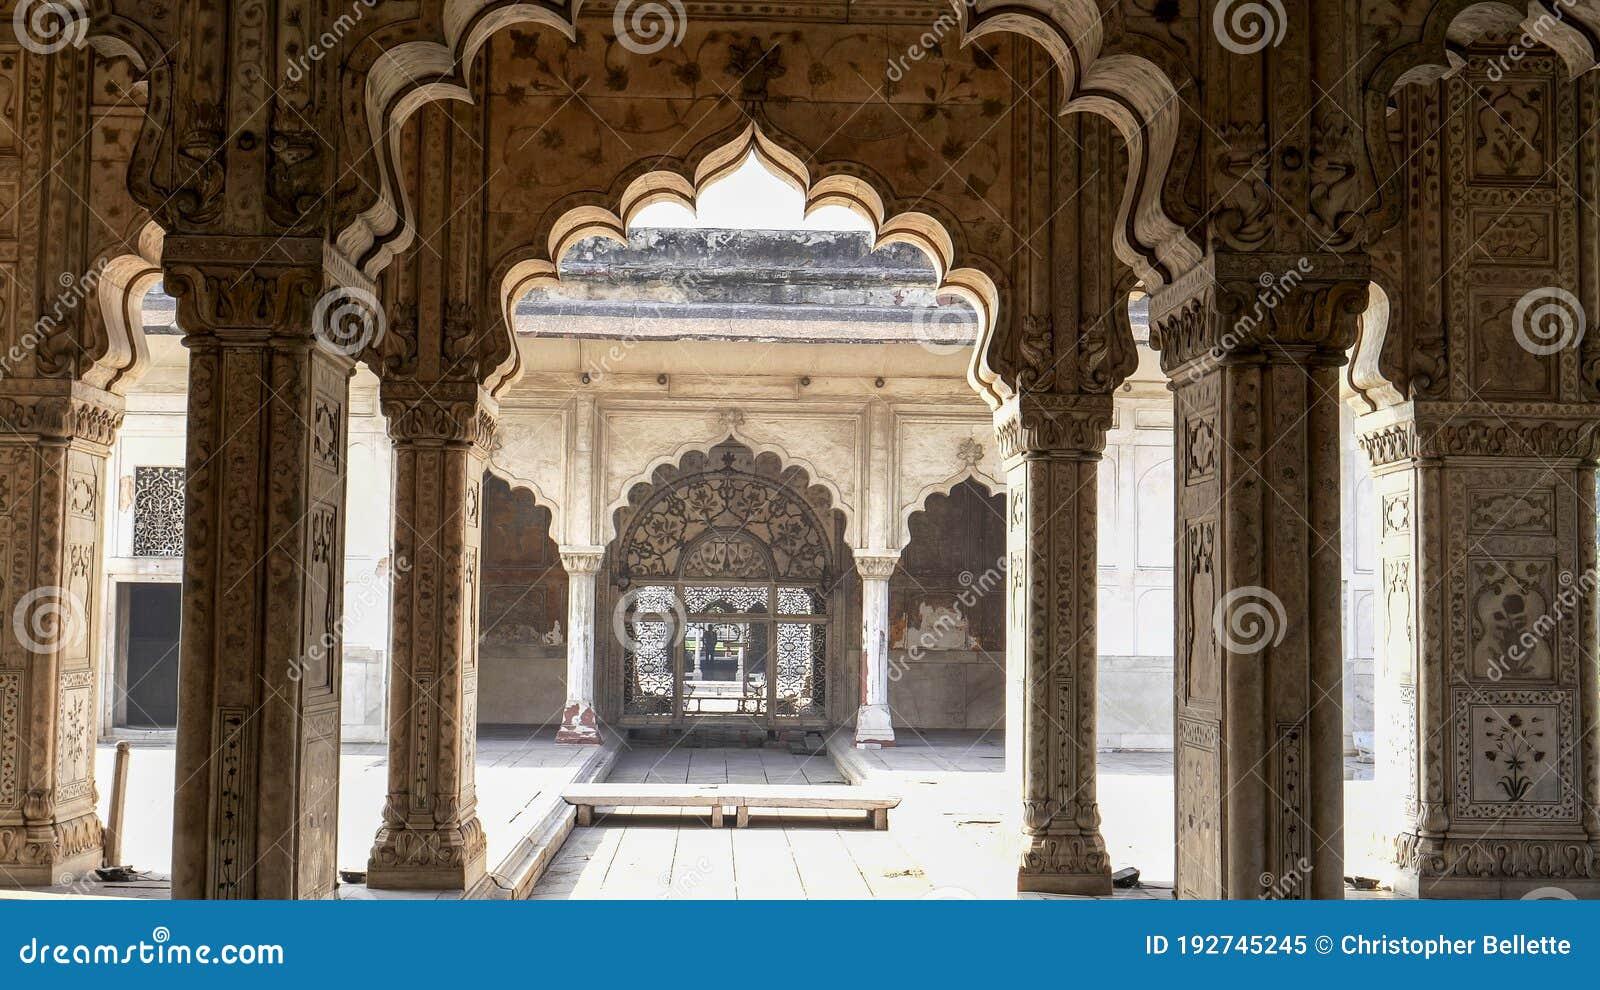 Pixelated Memories: Diwan-i-Am, Red Fort, New Delhi